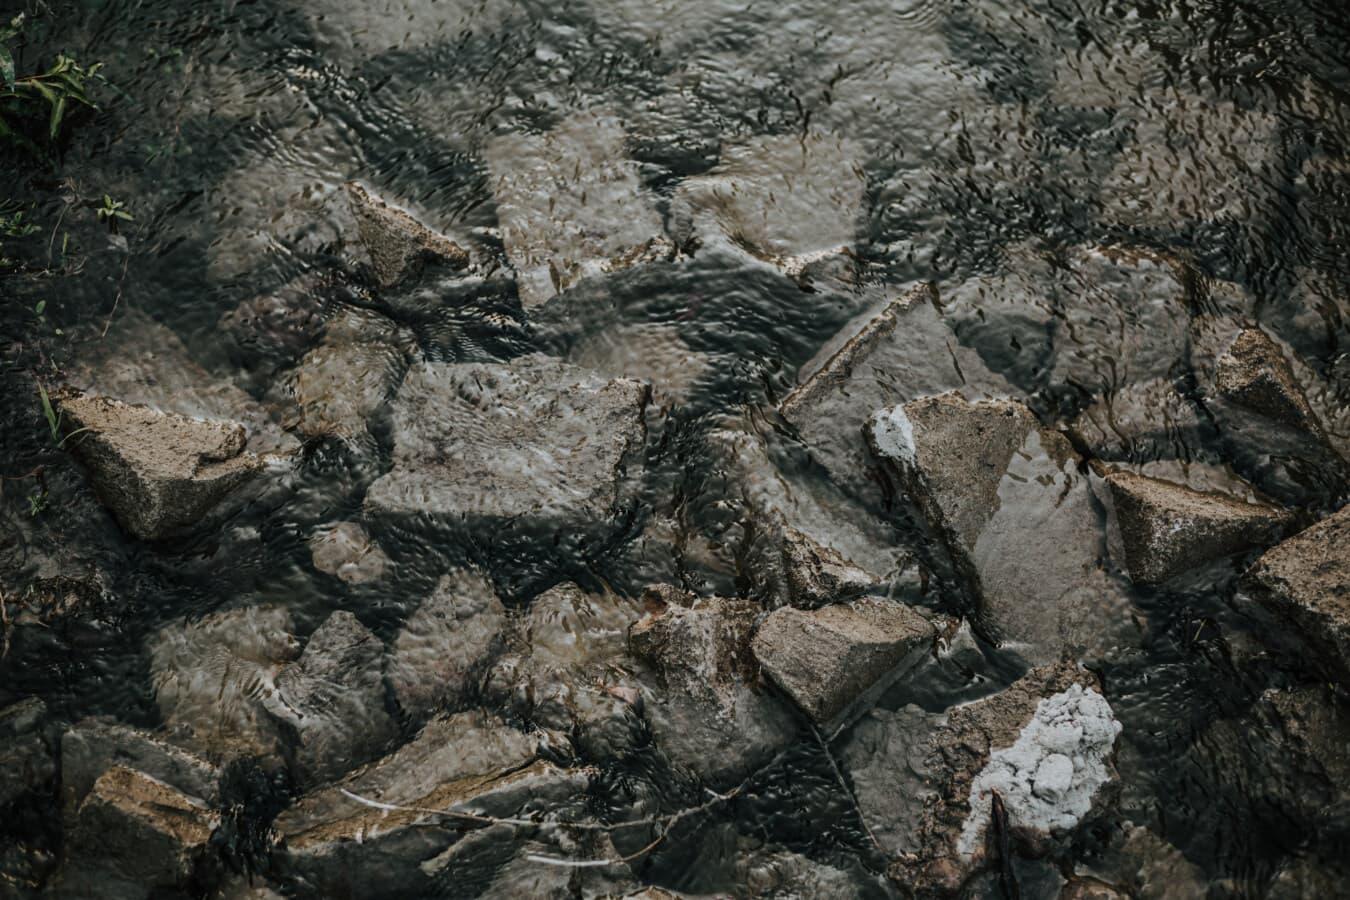 Fluss, Flussufer, Flussbett, große Steine, Natur, Rock, dreckig, Wasser, im freien, rau